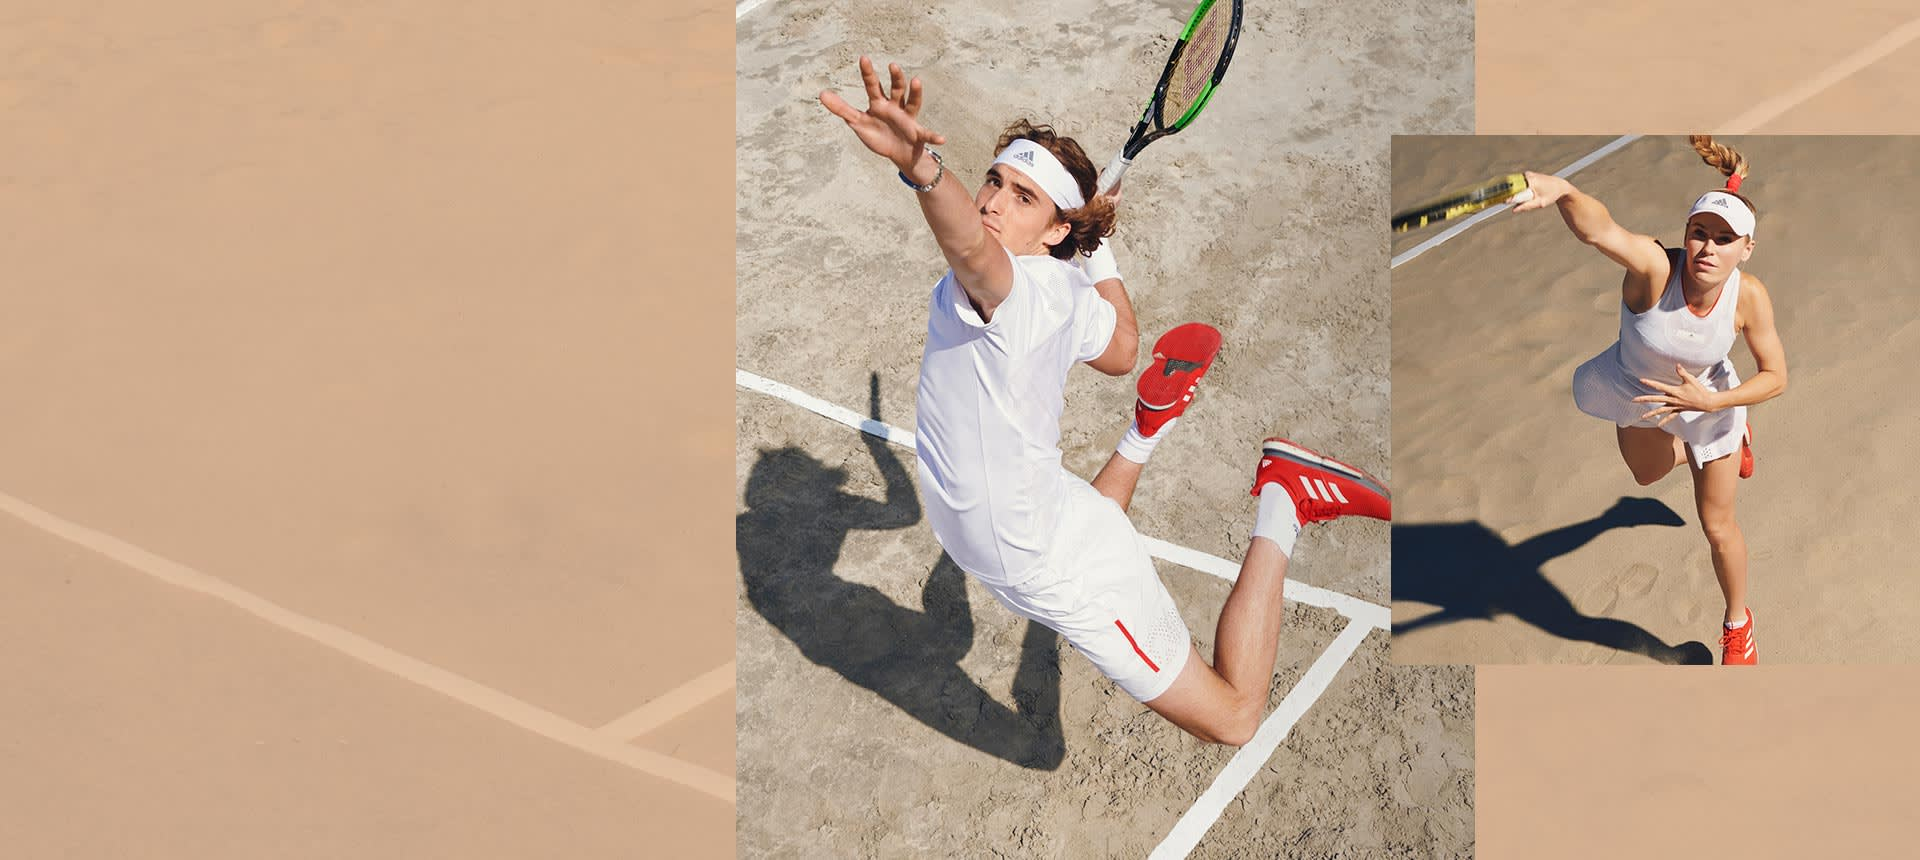 40f3110f2 THE TENNIS KIT BY STELLA MCCARTNEY